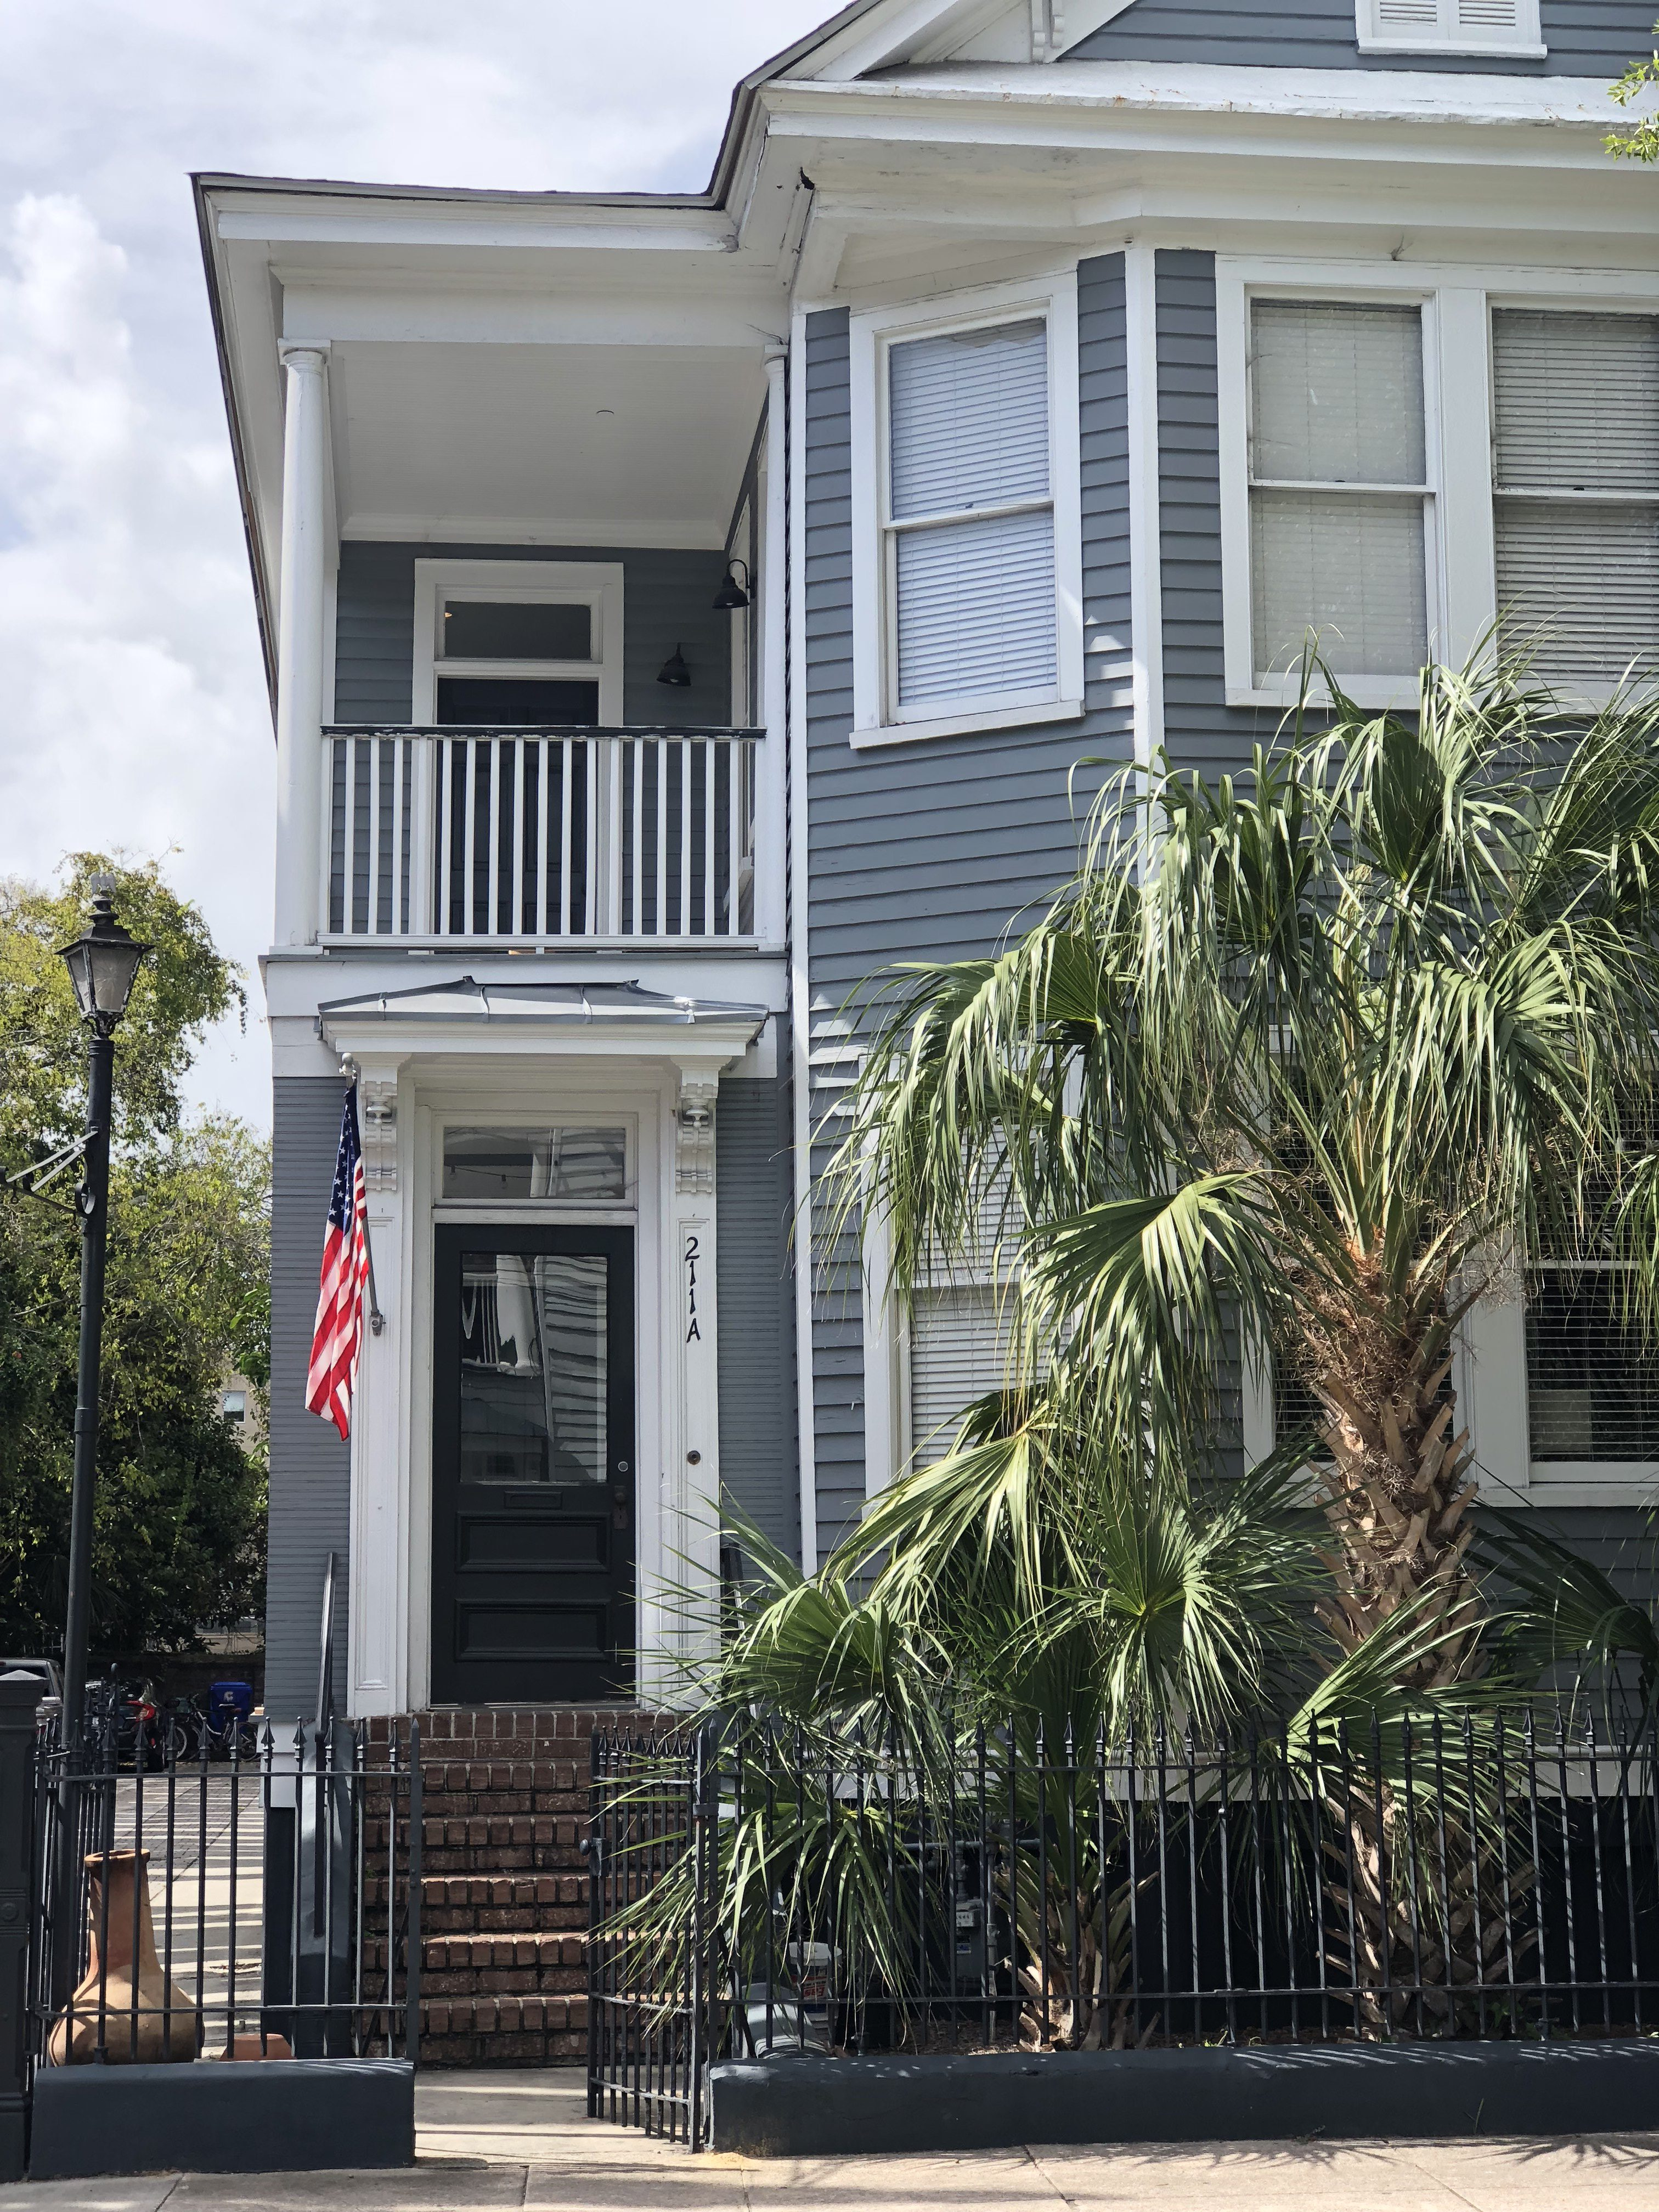 PaleOMG - From Dallas to Charleston